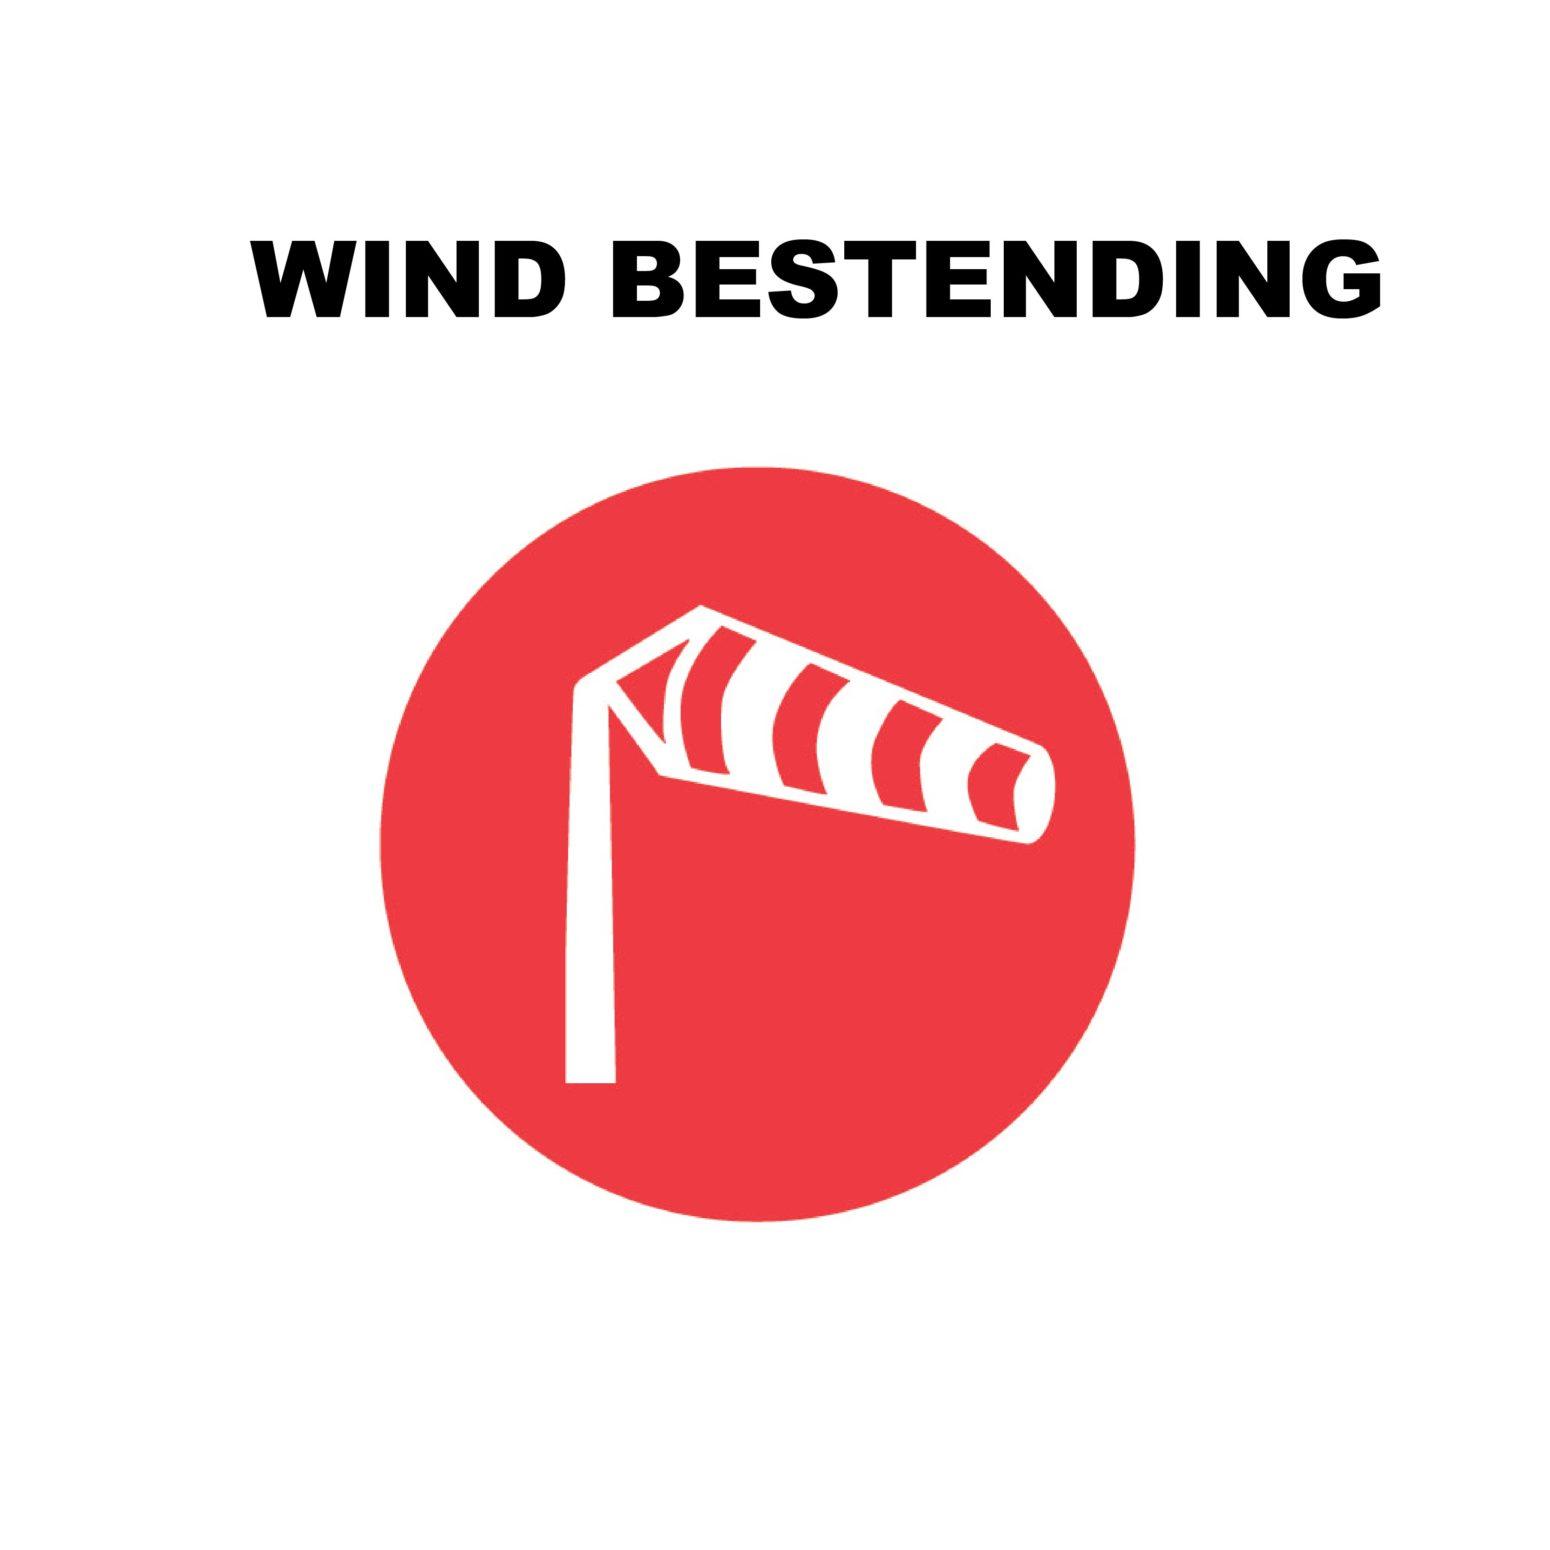 windbestendig icoon